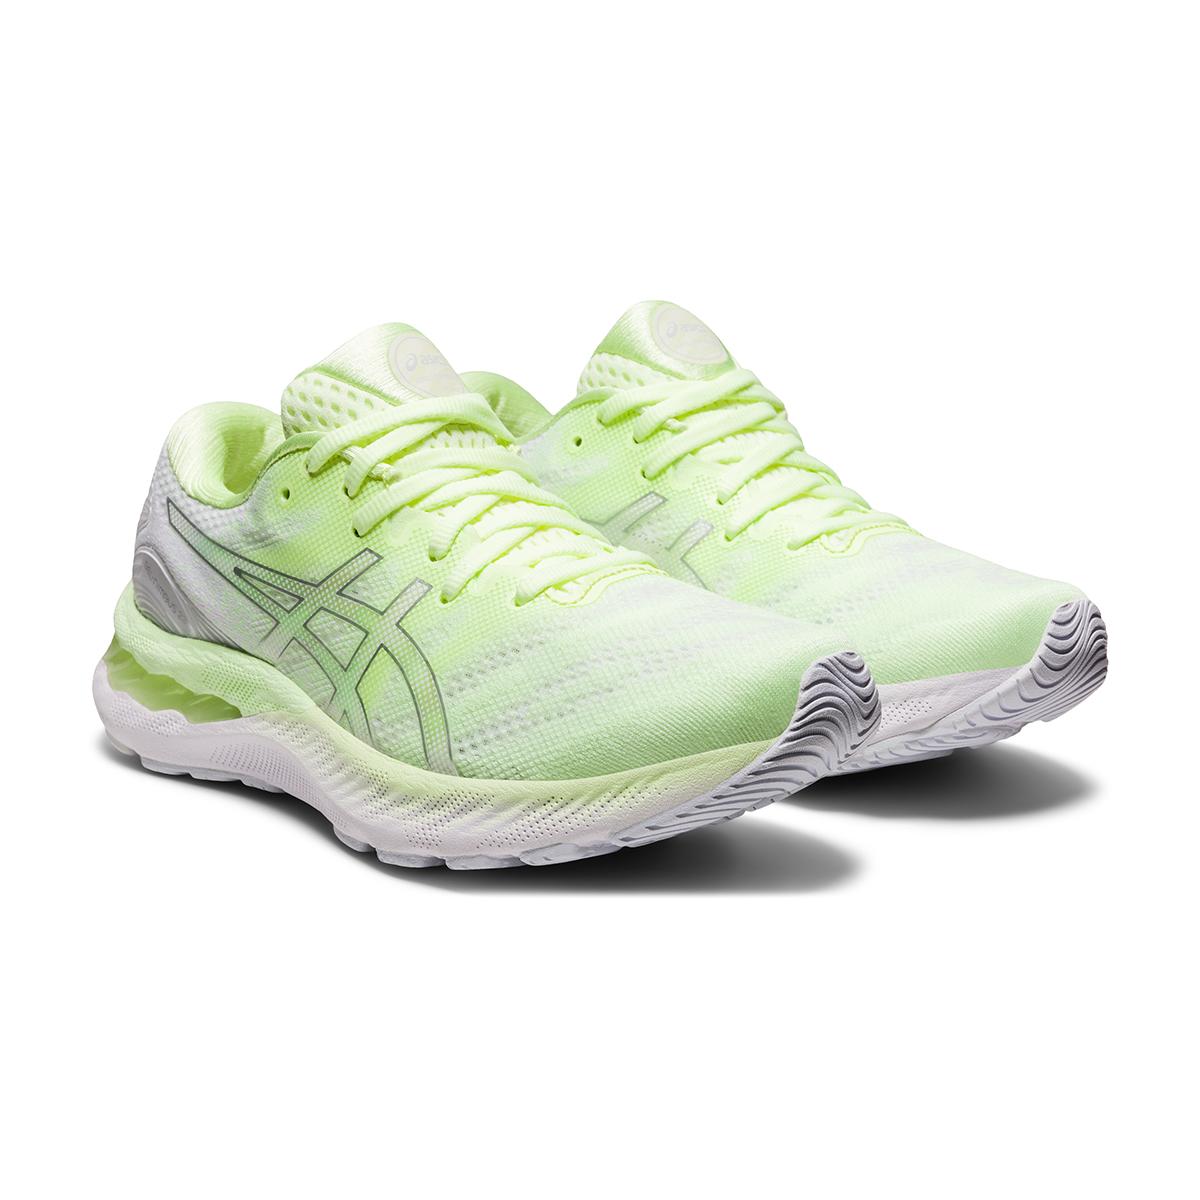 Women's Asics Gel-Nimbus 23 Running Shoe - Color: Illuminate Yellow - Size: 5 - Width: Regular, Illuminate Yellow, large, image 3